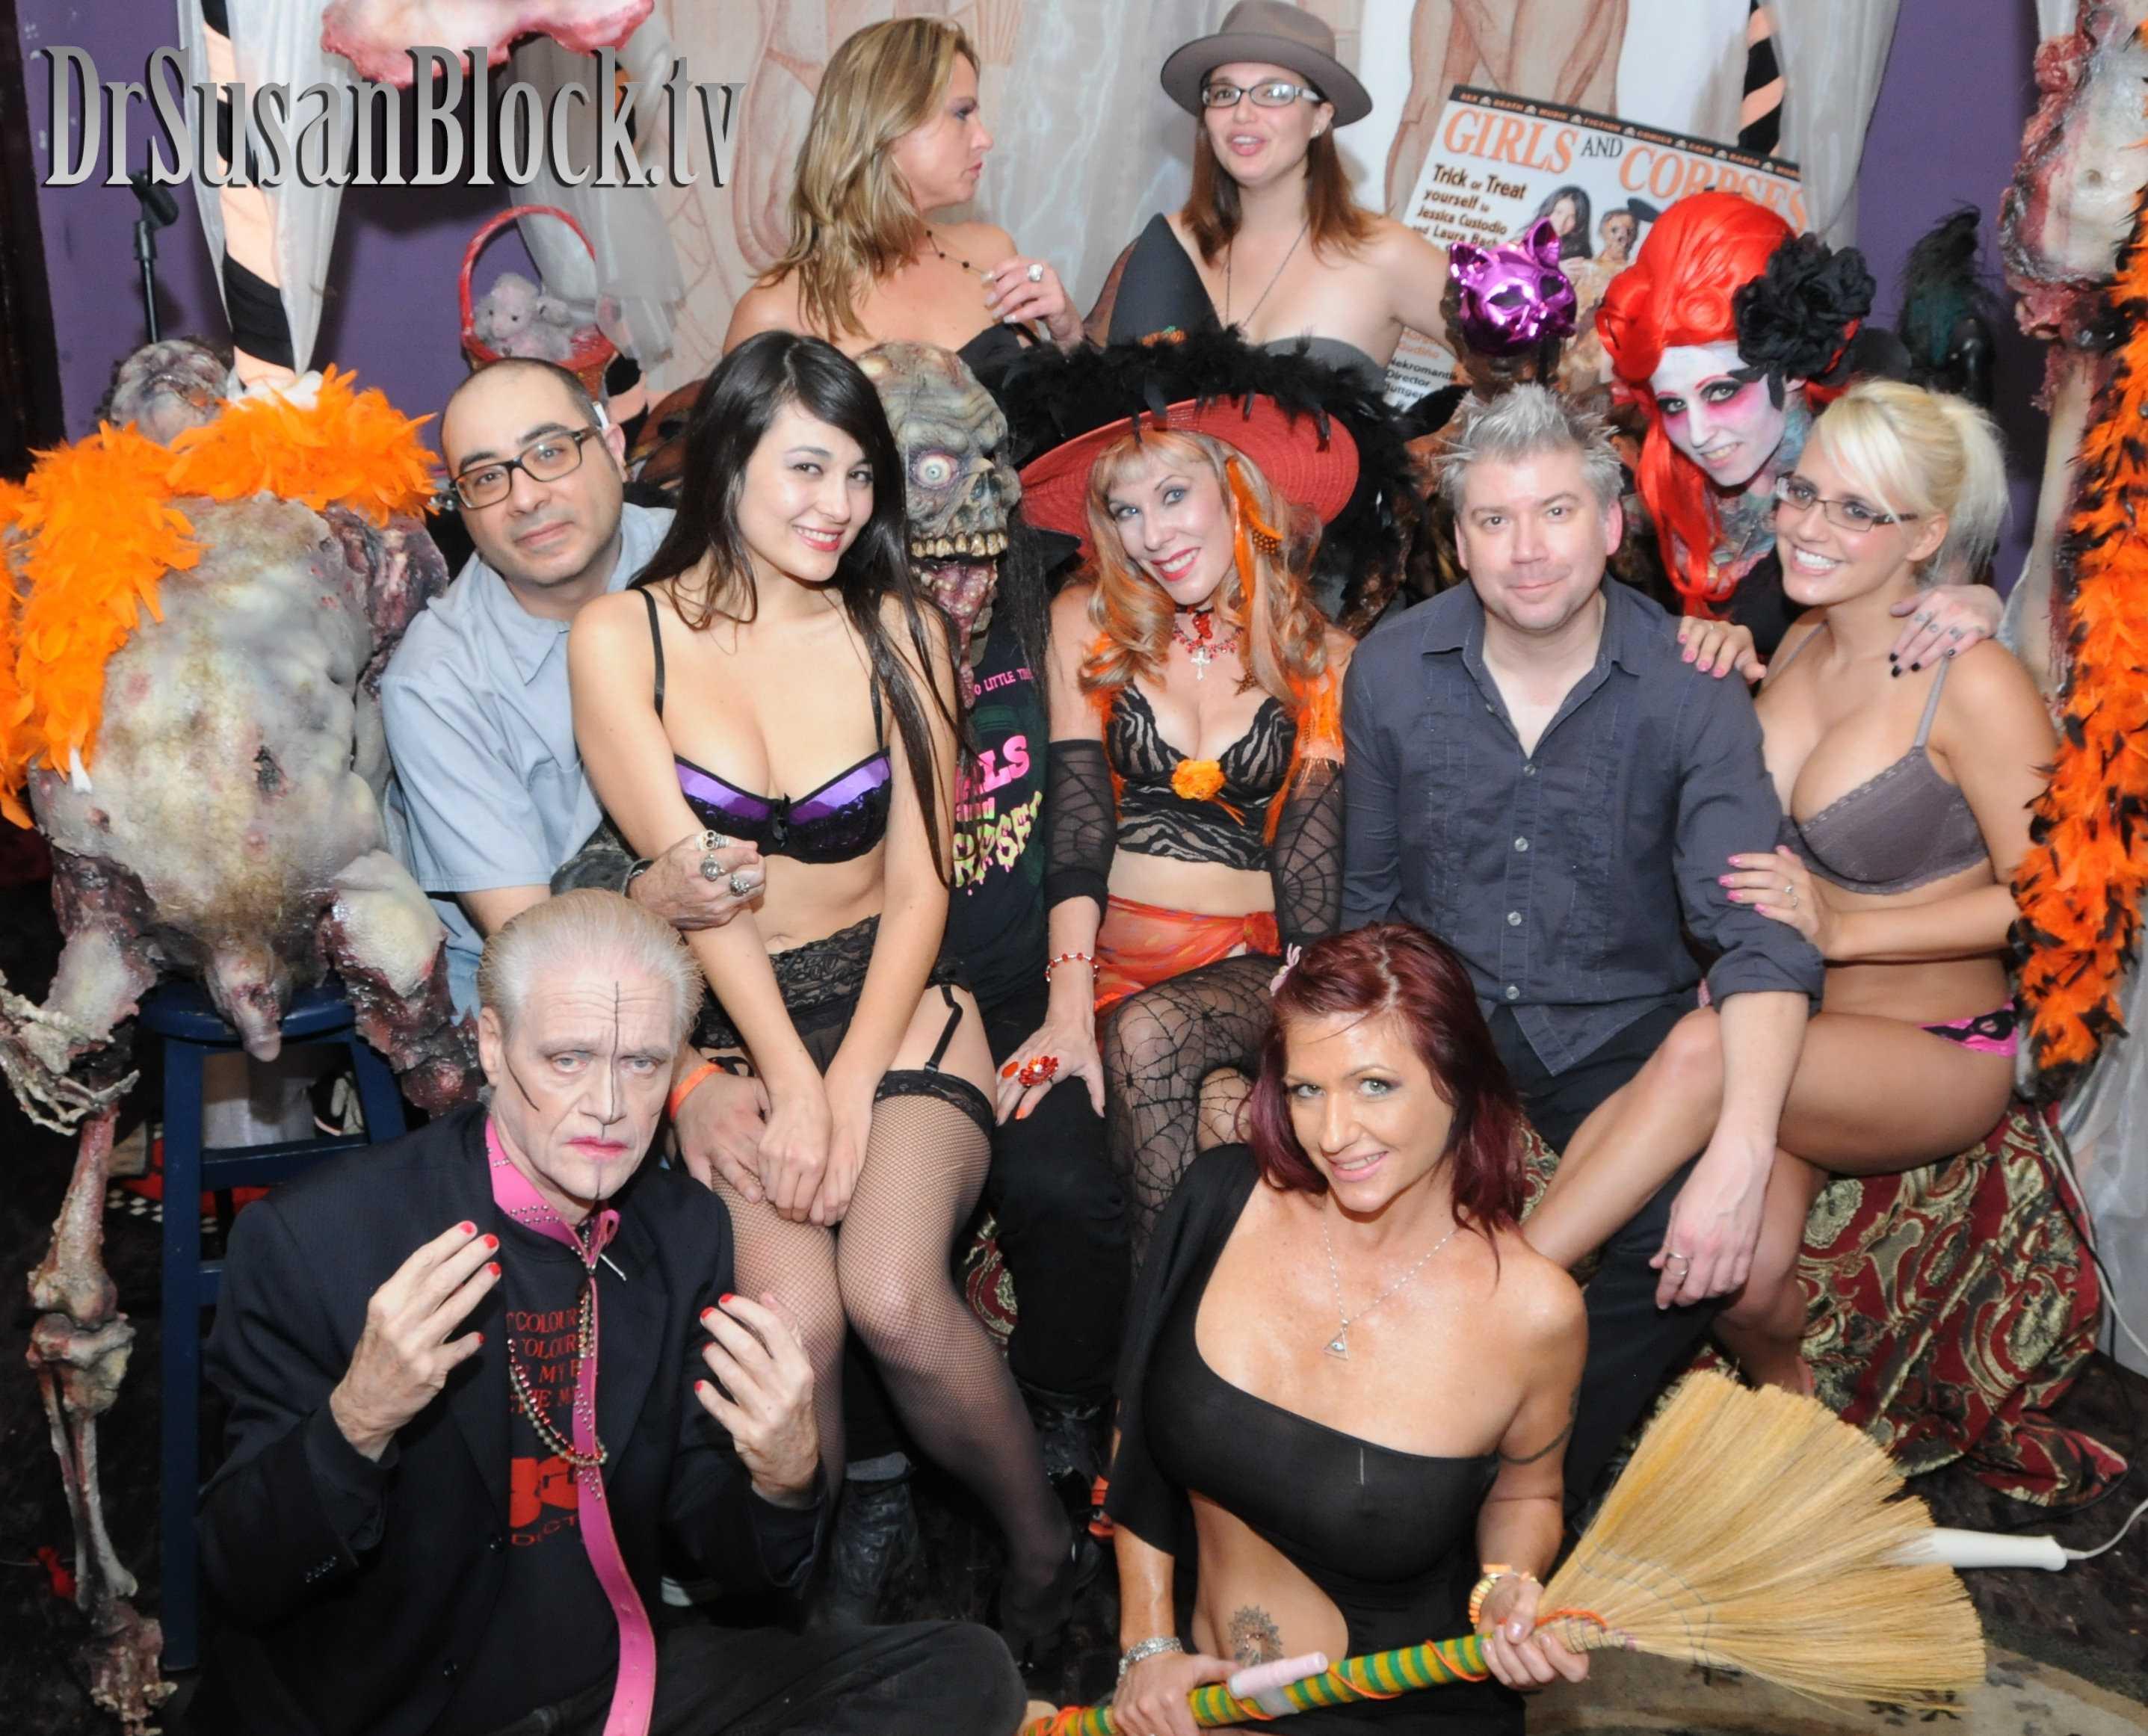 With Kim Fowley, Mr. Exxx, Sophia Jade, Corpsy, Amanda Blow, Daniella, Brittany Blaze, Chris Gore, Brianna Belladonna & Jacky Joy. Photo: Irwin J